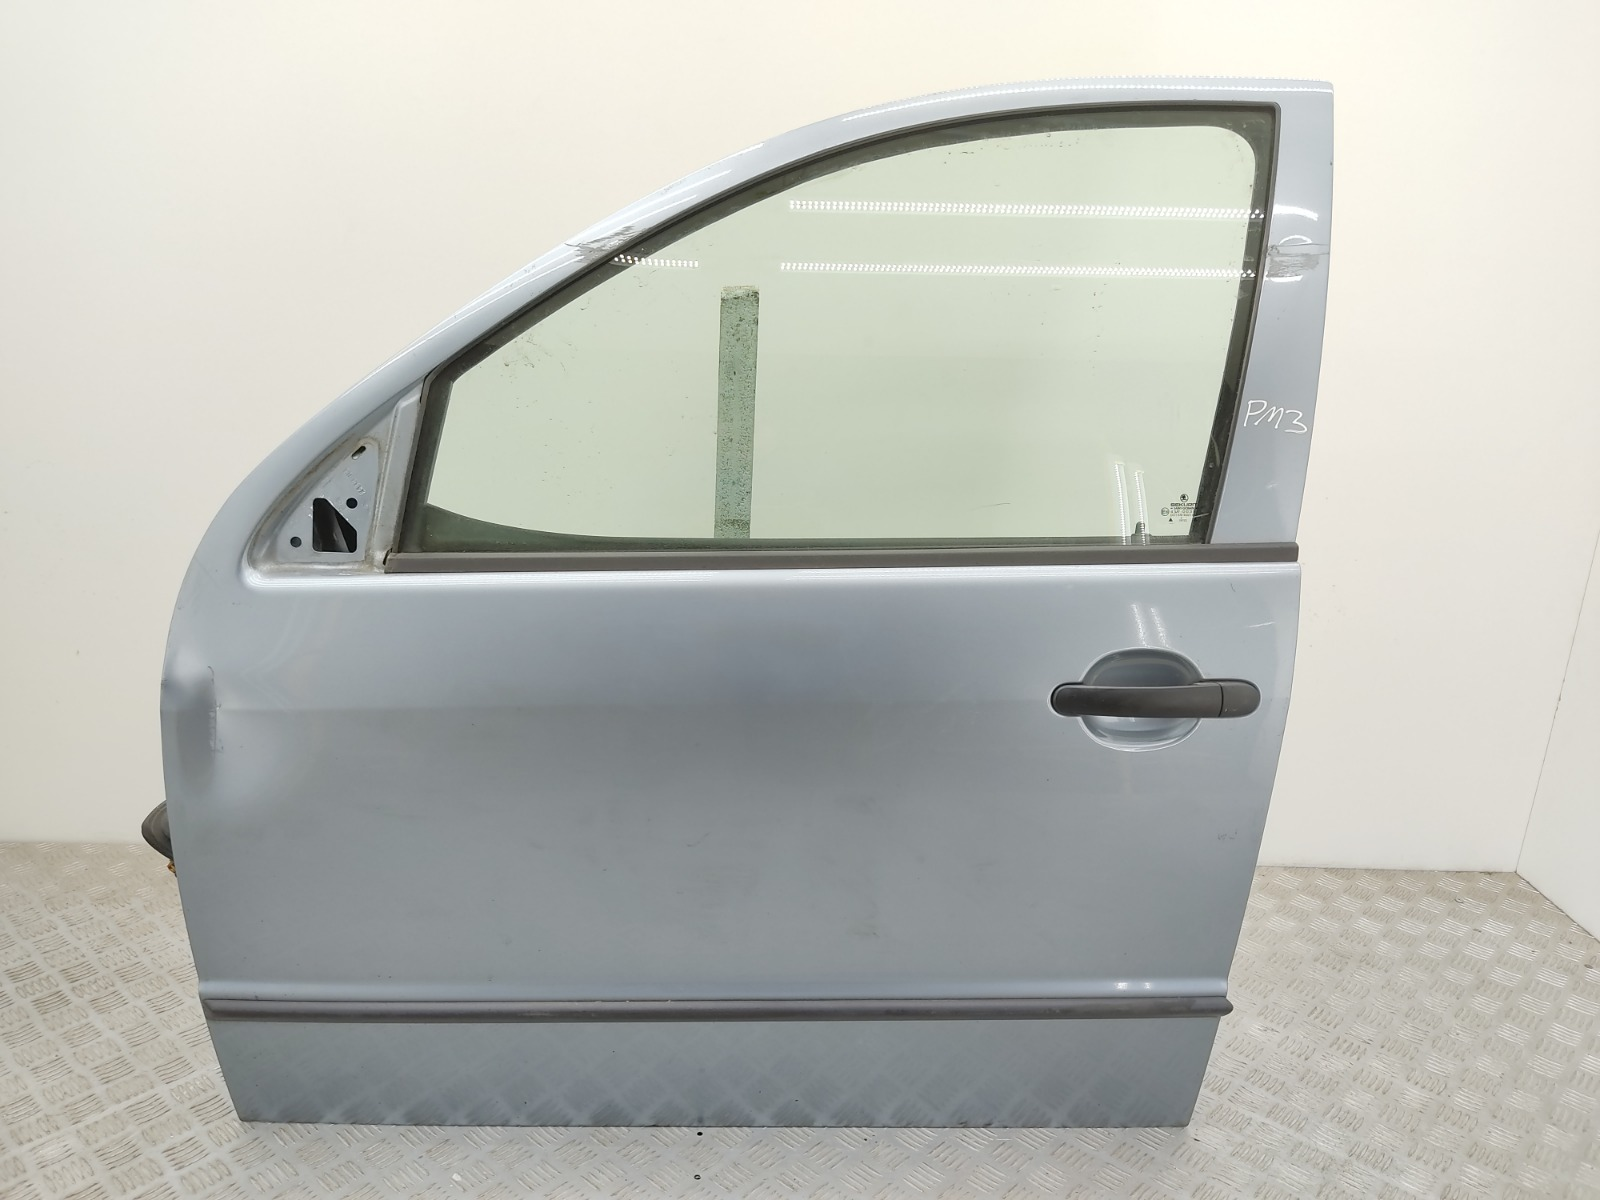 Дверь передняя левая Skoda Fabia 1 1.4 TDI 2003 (б/у)